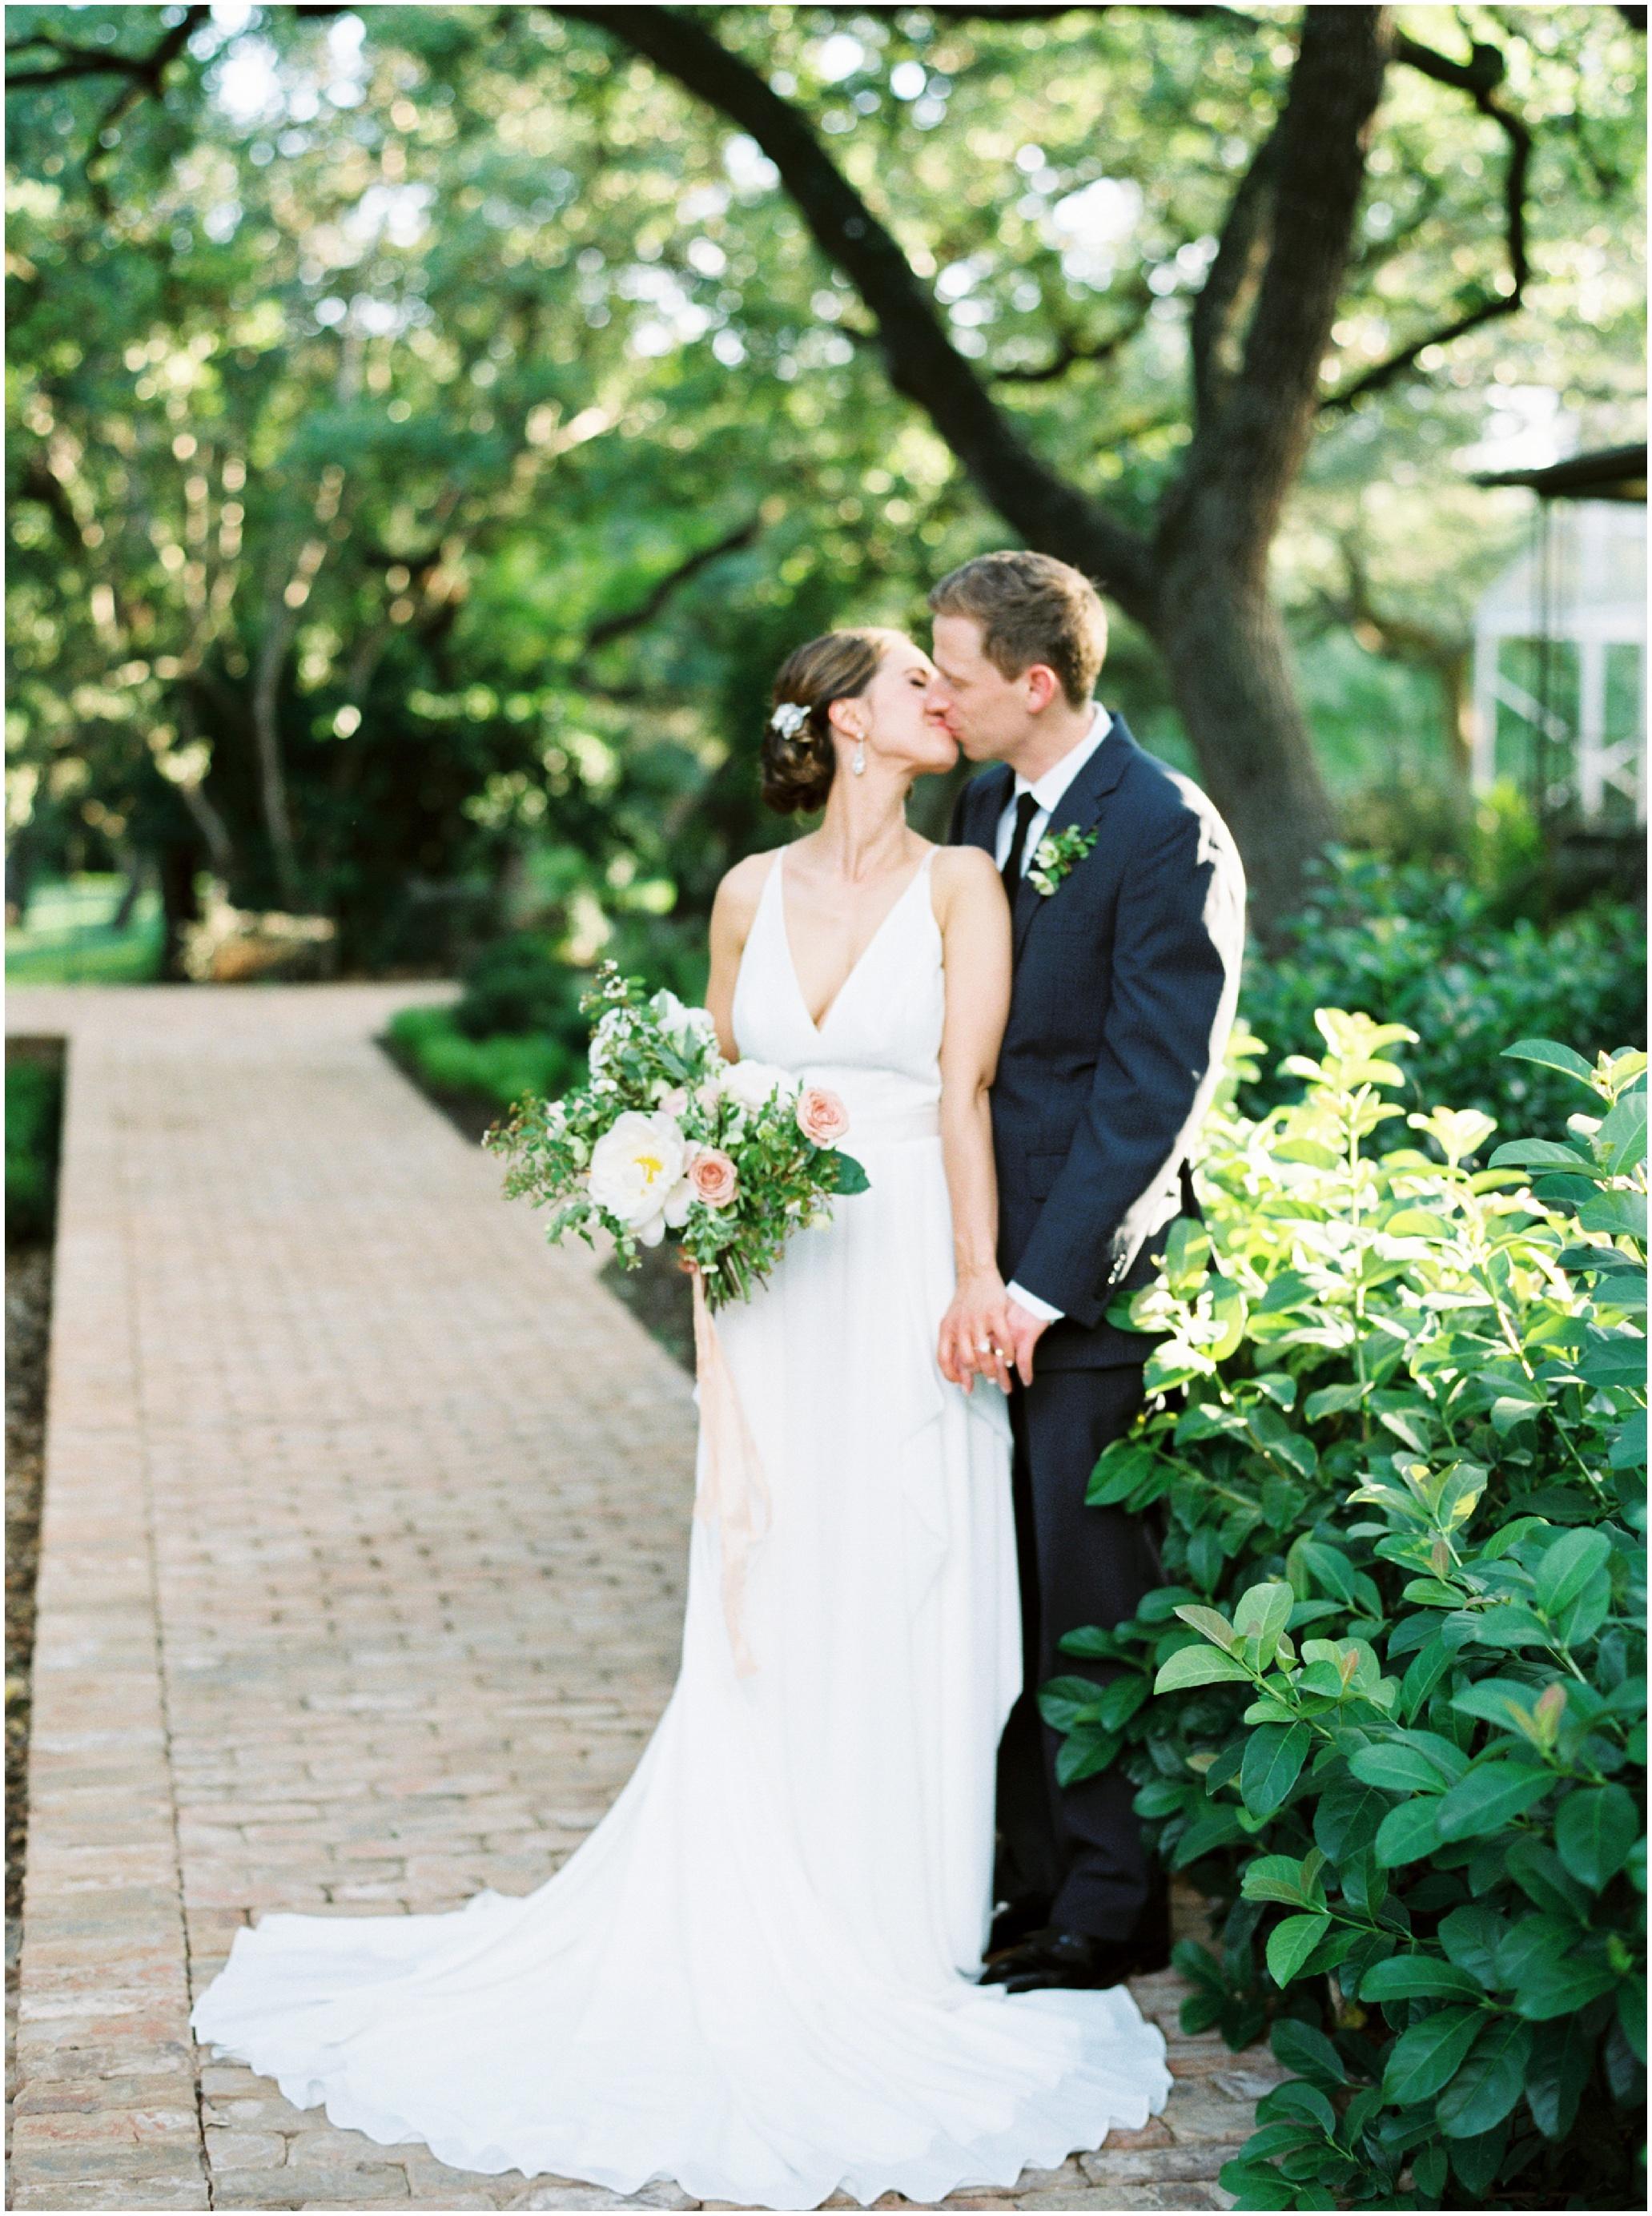 San Antonio Wedding Photographer, Film Photographer, Lost Mission_0108.jpg